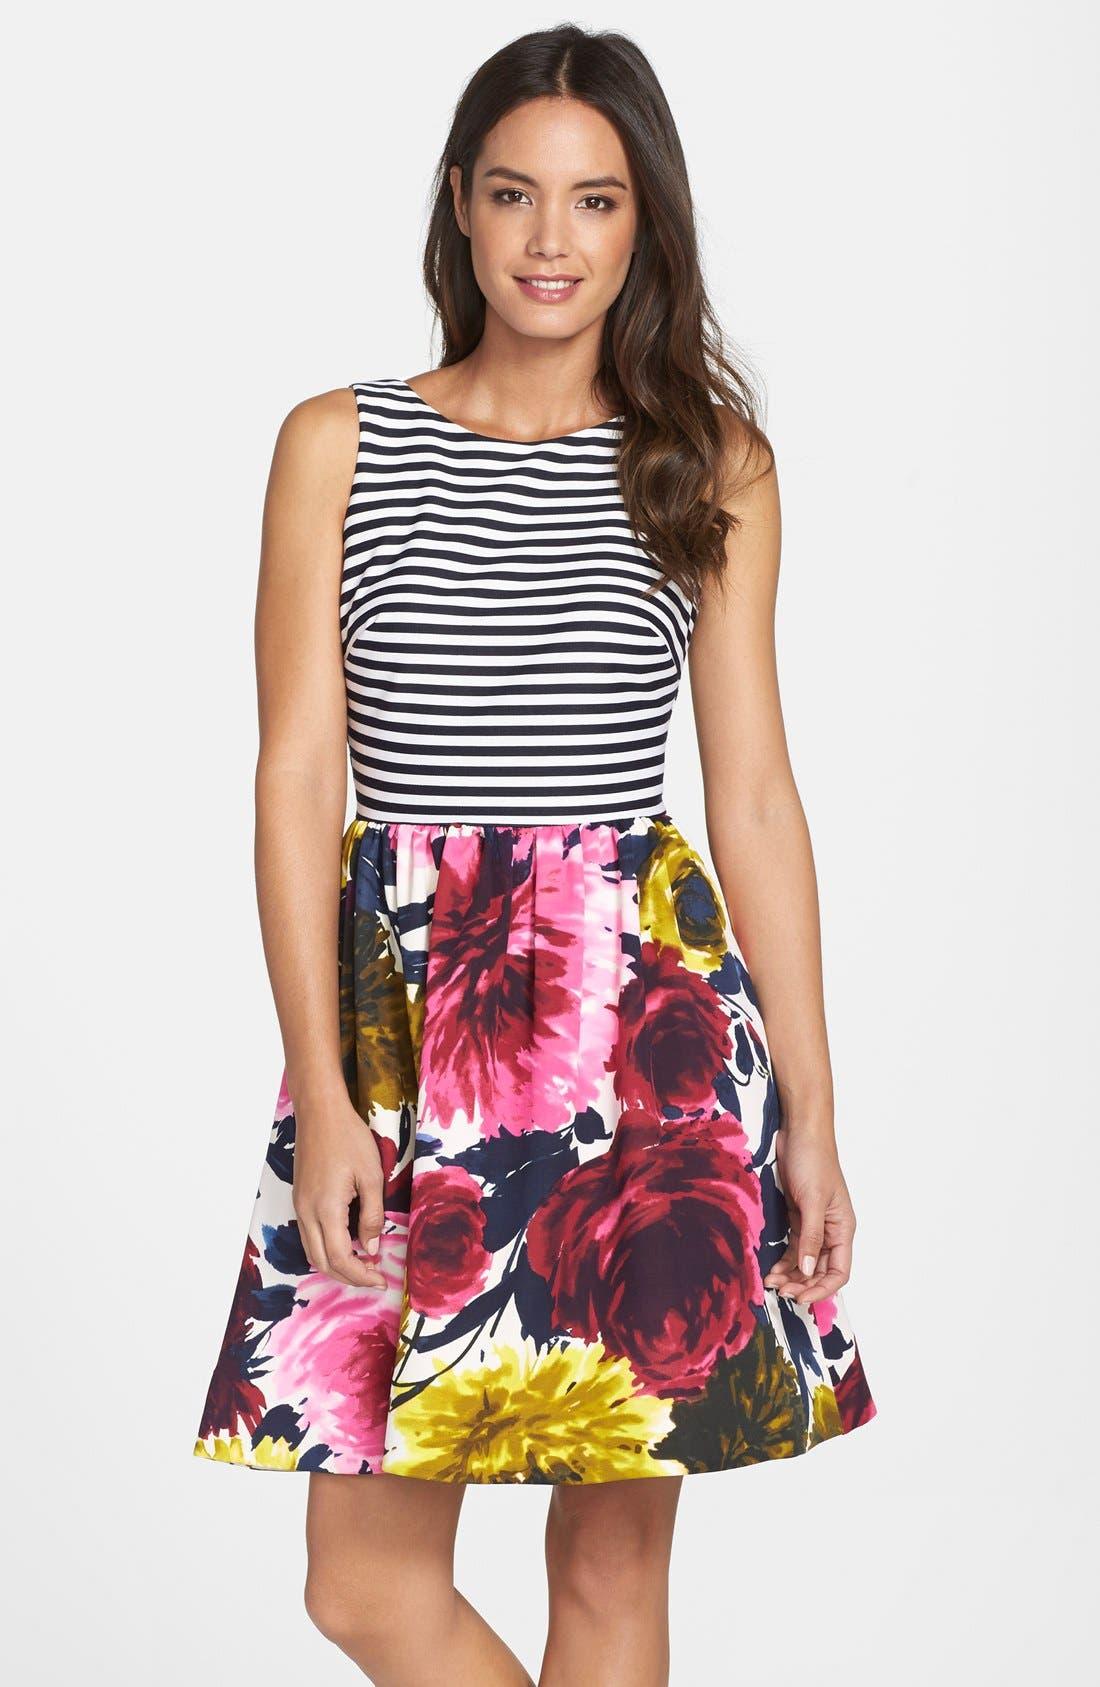 Main Image - Taylor Dresses Mixed Print Fit & Flare Dress